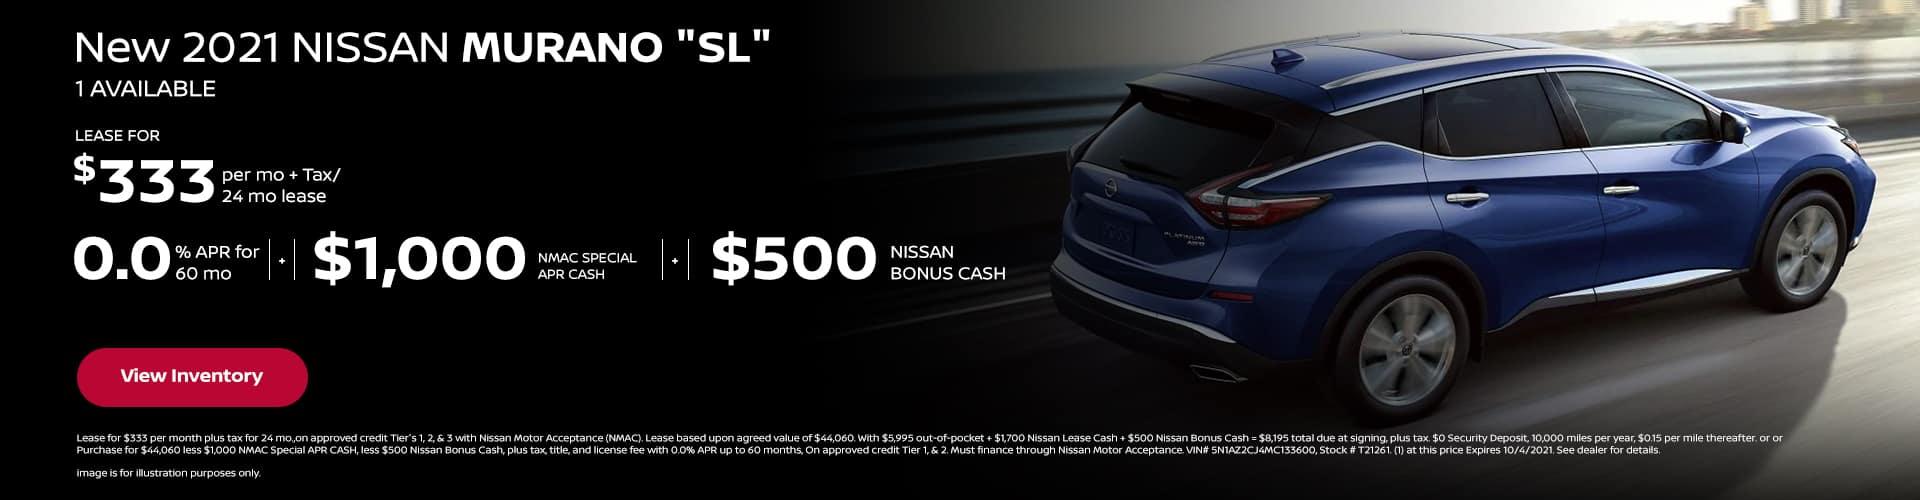 "0% APR x 60 mo + $1,000 Special APR Cash + $500 Nissan Bonus Cash New 2021 NISSAN MURANO ""SL"" (1) AVAILABLE $333 per mo. + Tax / 24 mo lease"